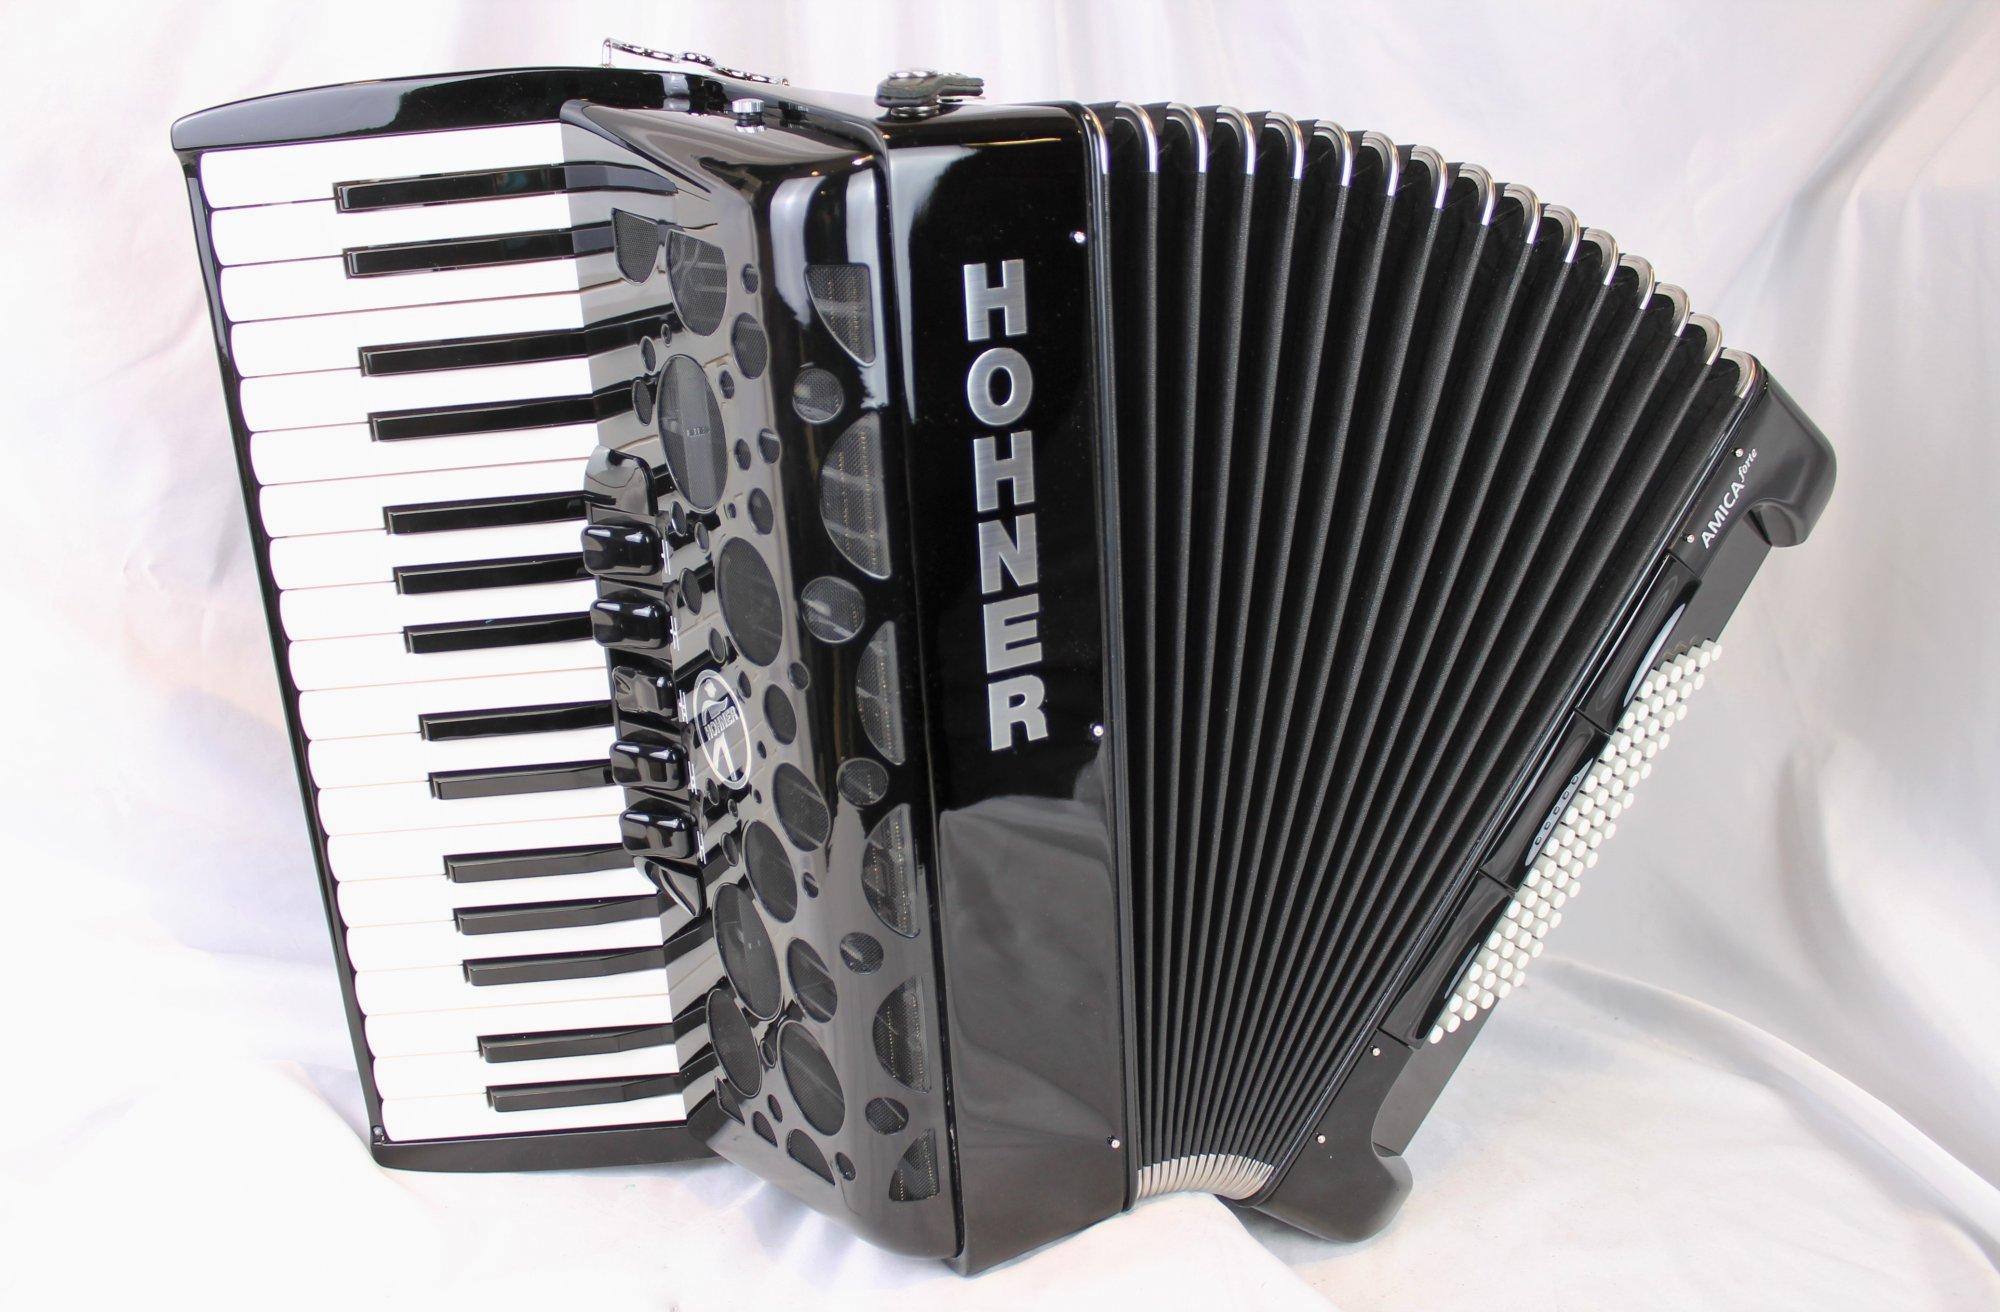 NEW Black Hohner Amica III Forte Piano Accordion LMM 34 72